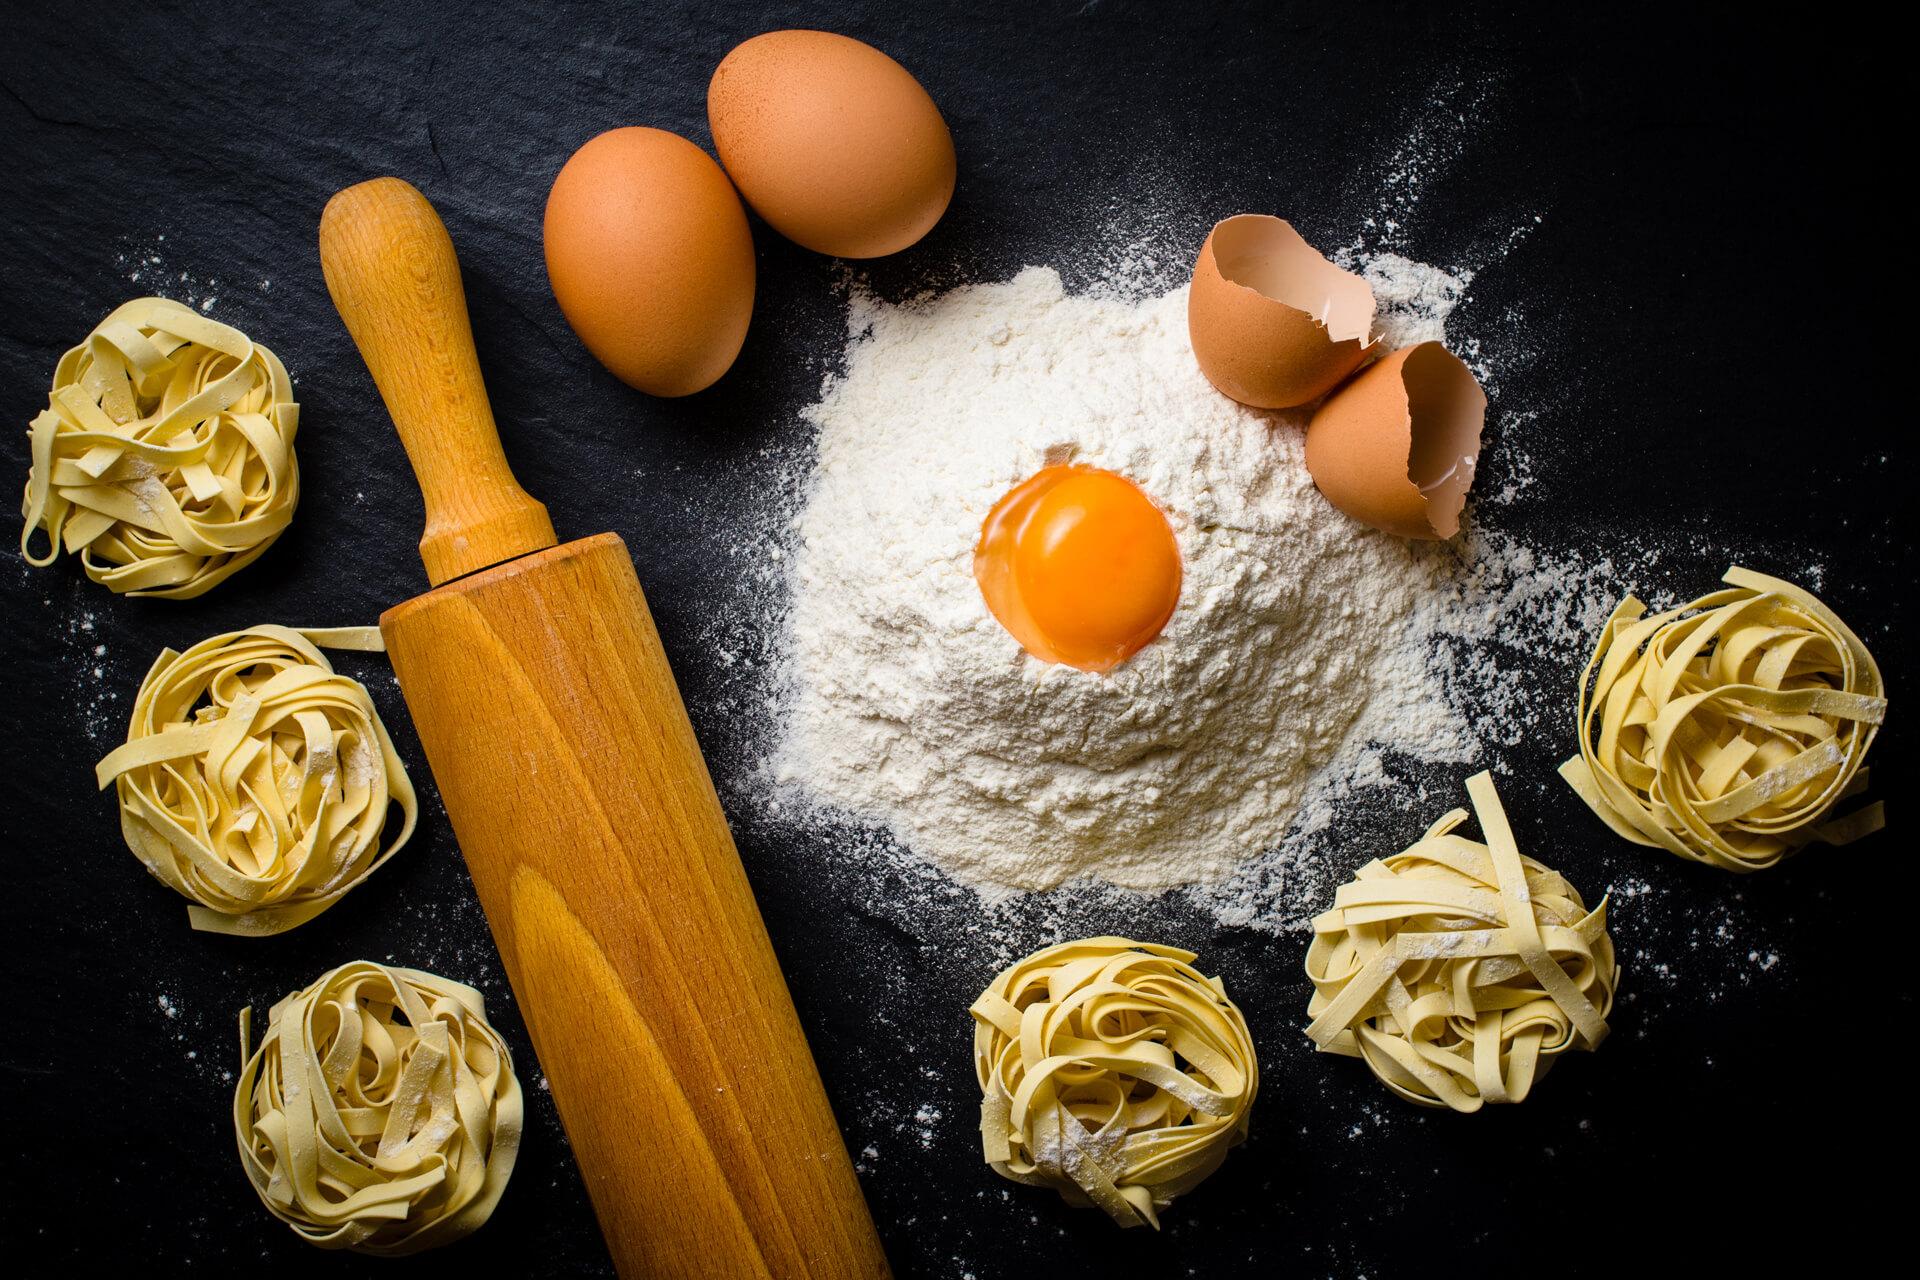 San Vito Romano Pasta all'uovo Corrado Quaresima